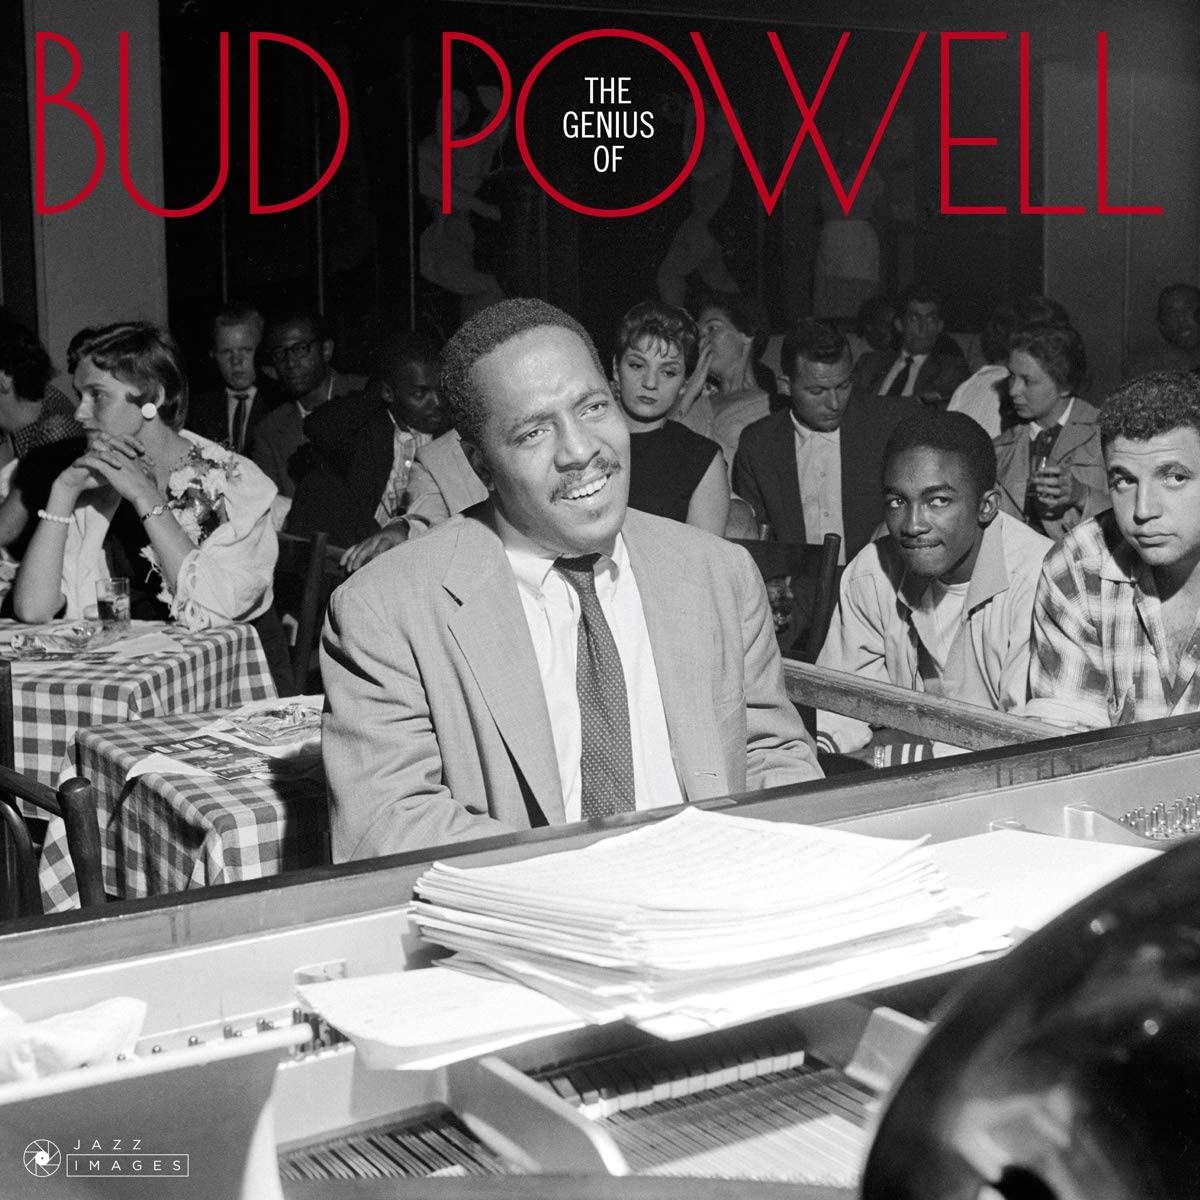 BUD POWELL - GENIUS OF BUD POWELL (LP)